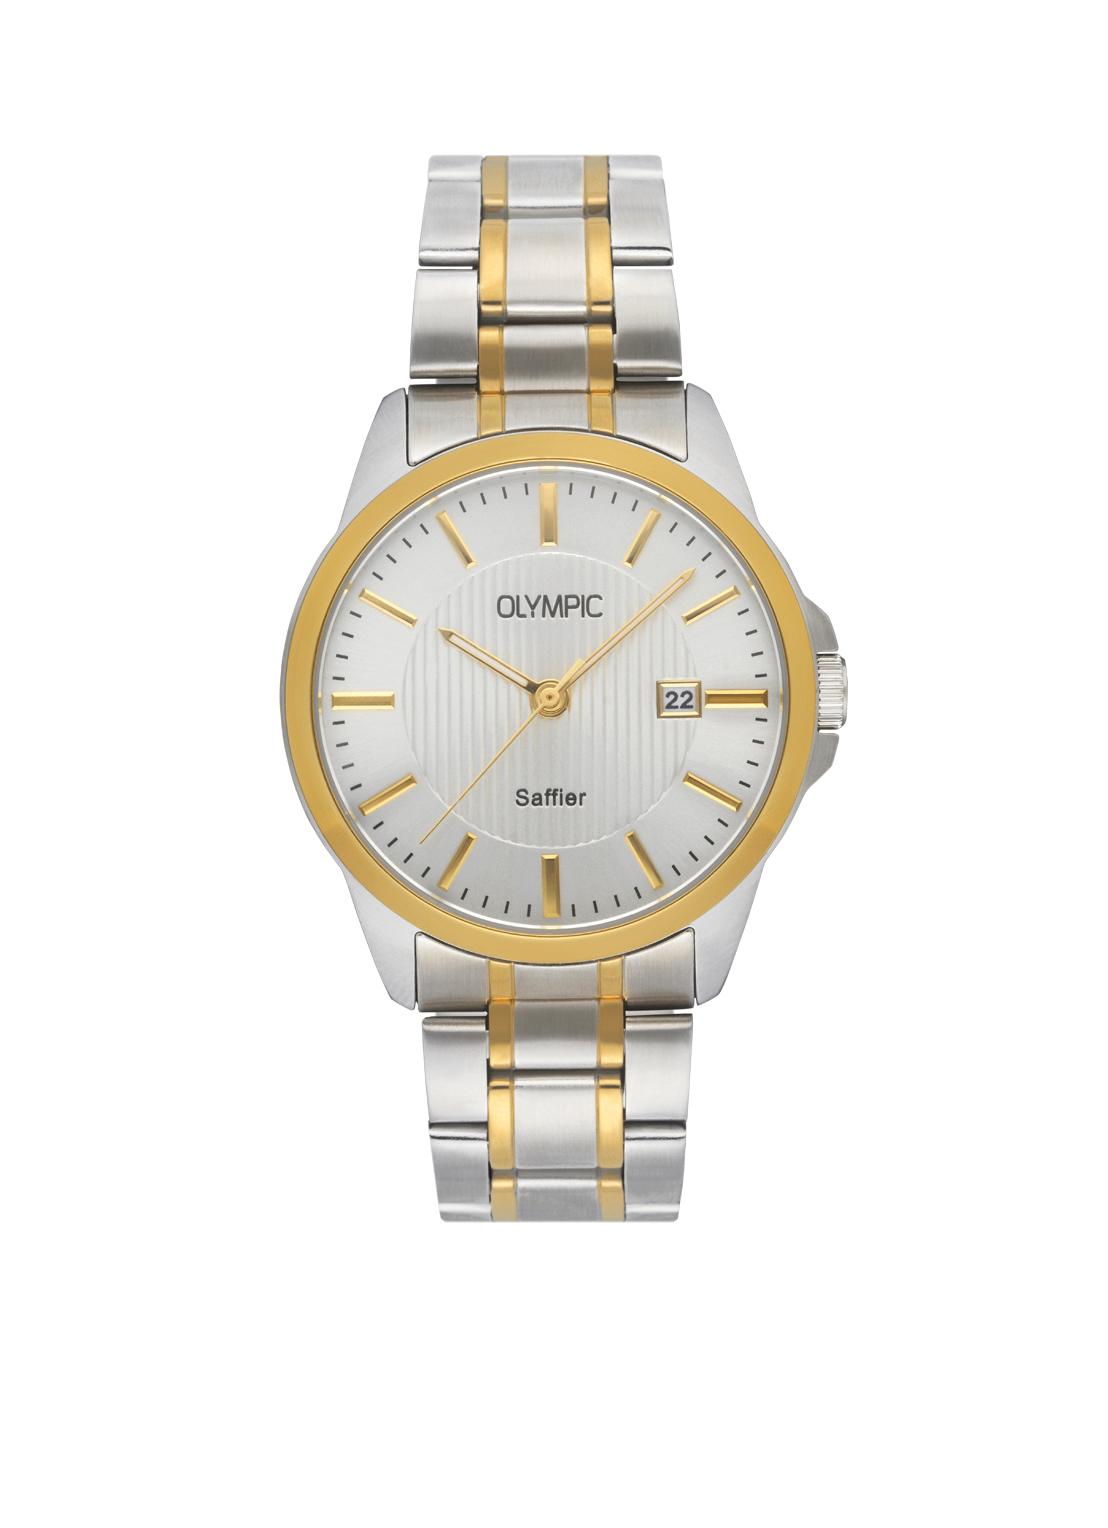 Olympic OL26HSS288B Bari Horloge Staal Zilverkleurig 39mm Heren